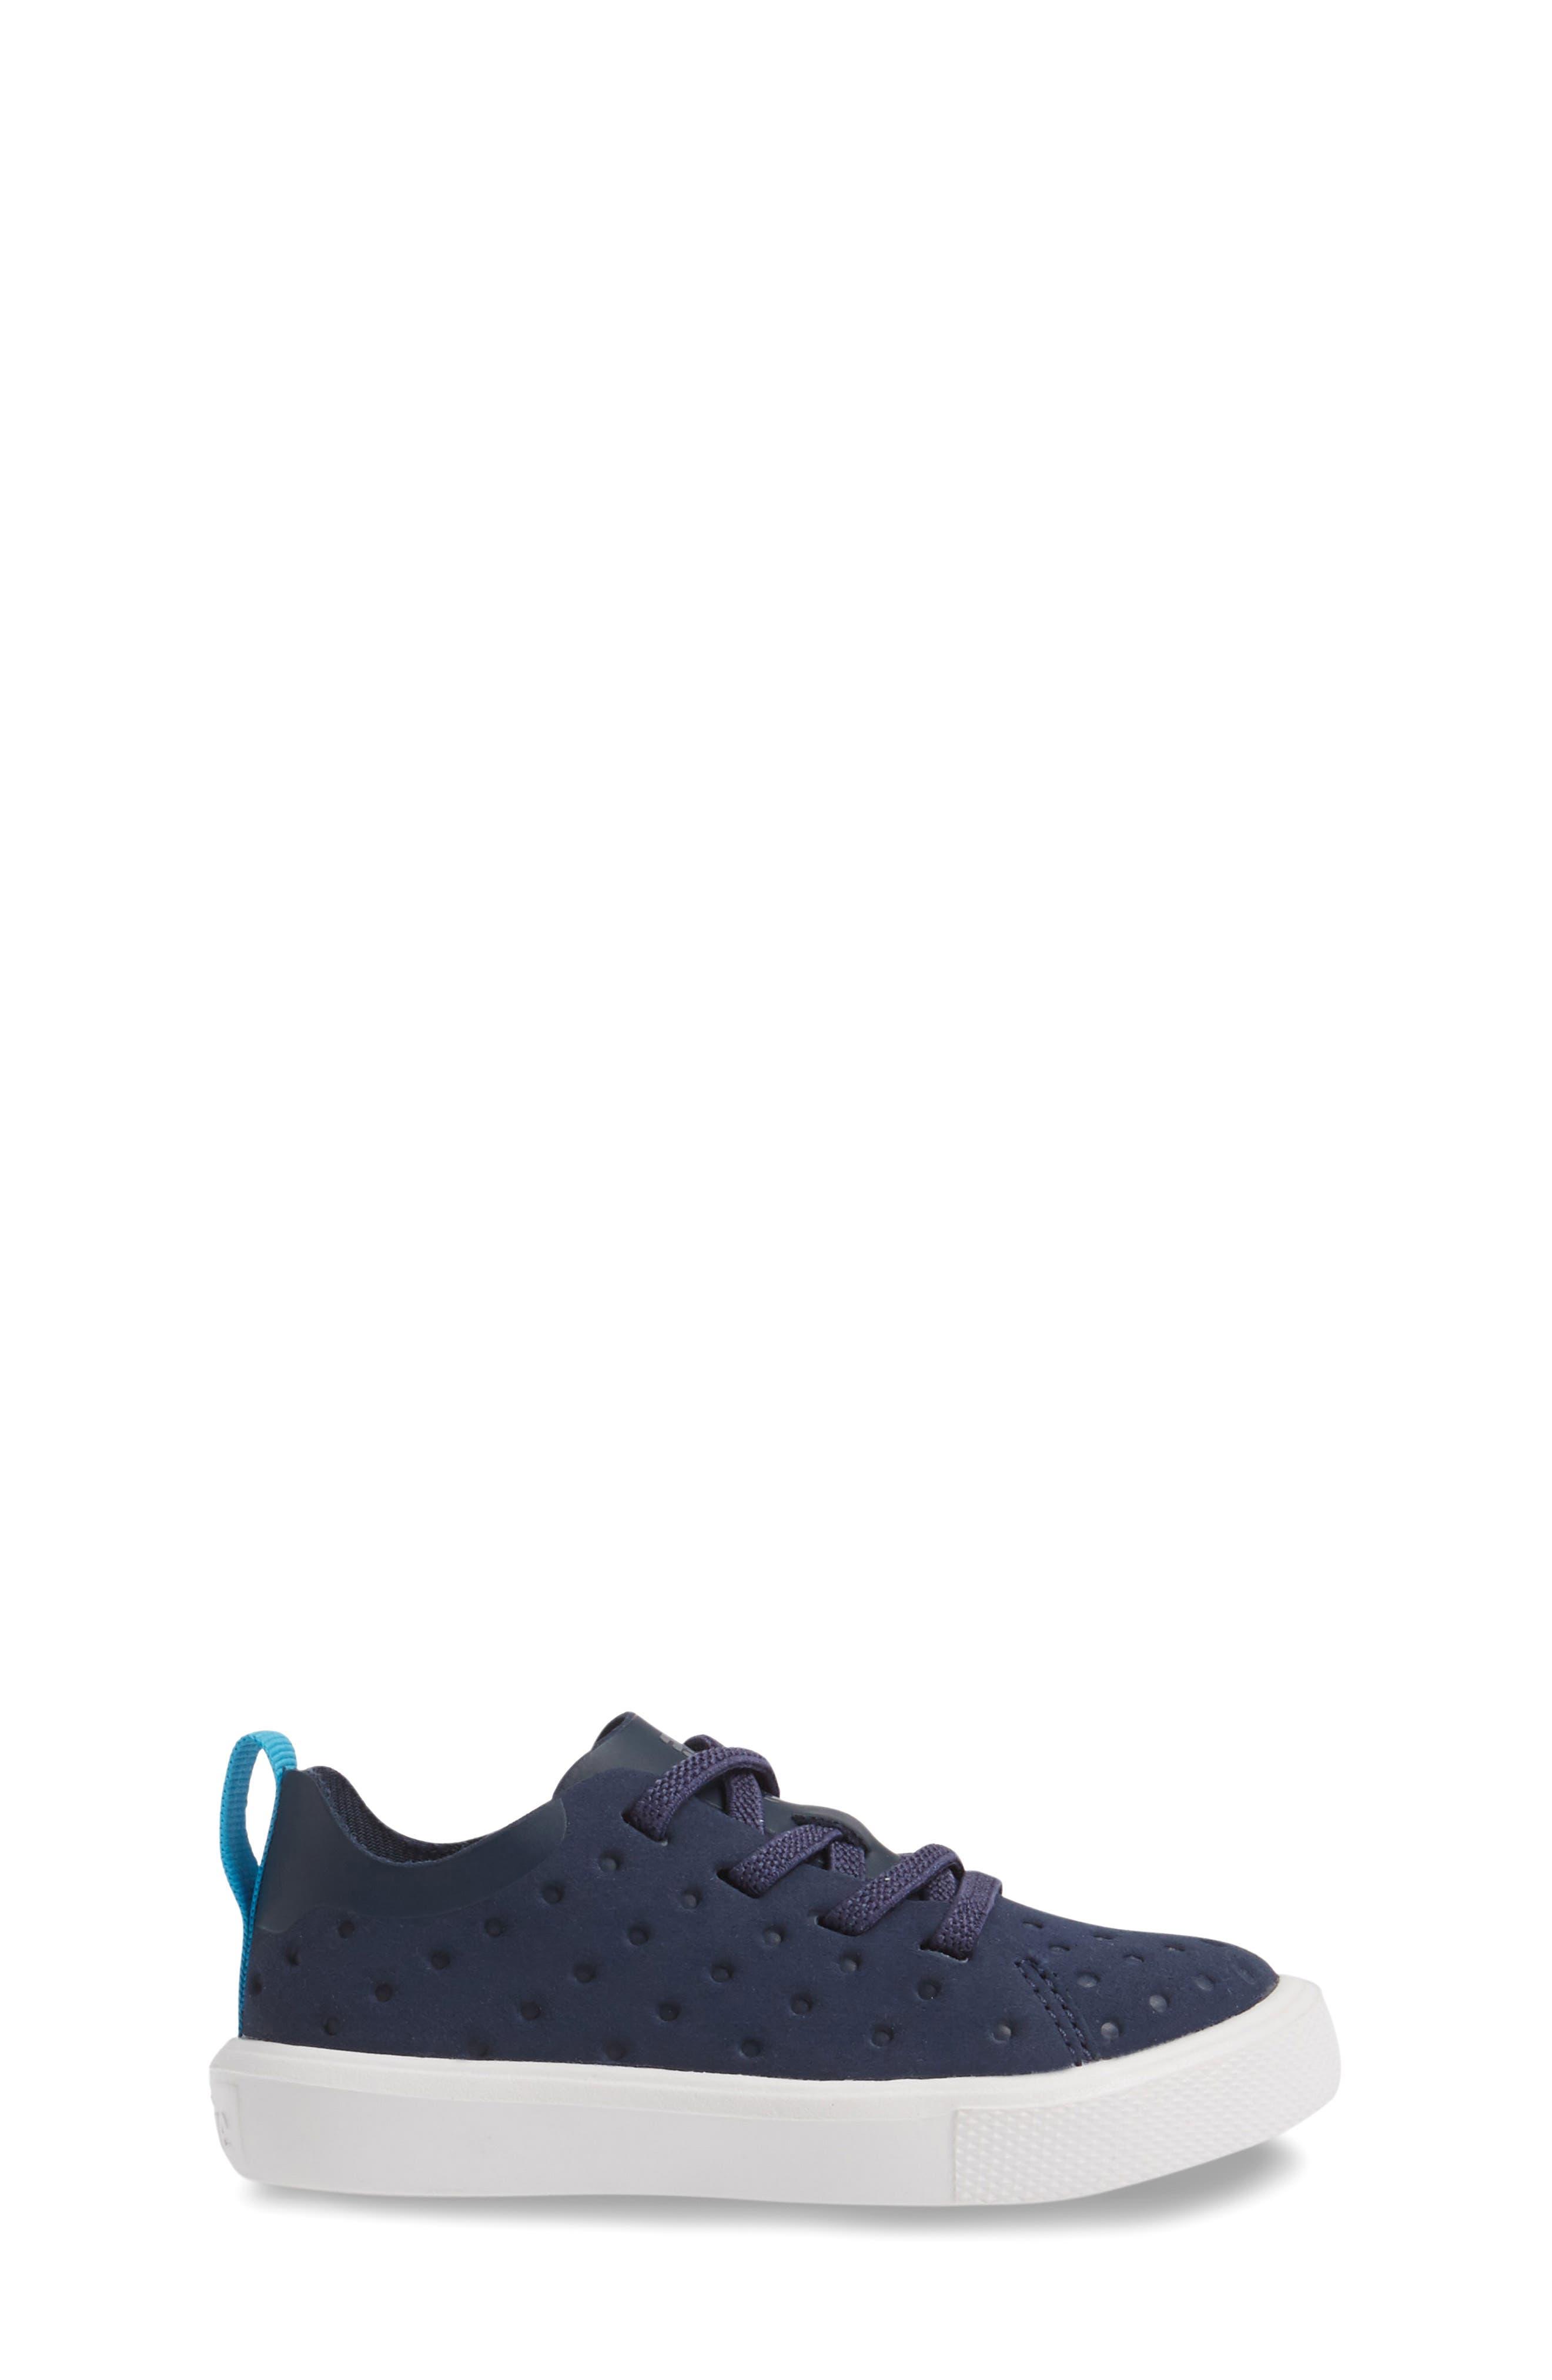 Alternate Image 3  - Native Shoes Monaco Water Repellent Sneaker (Walker, Toddler & Little Kid)